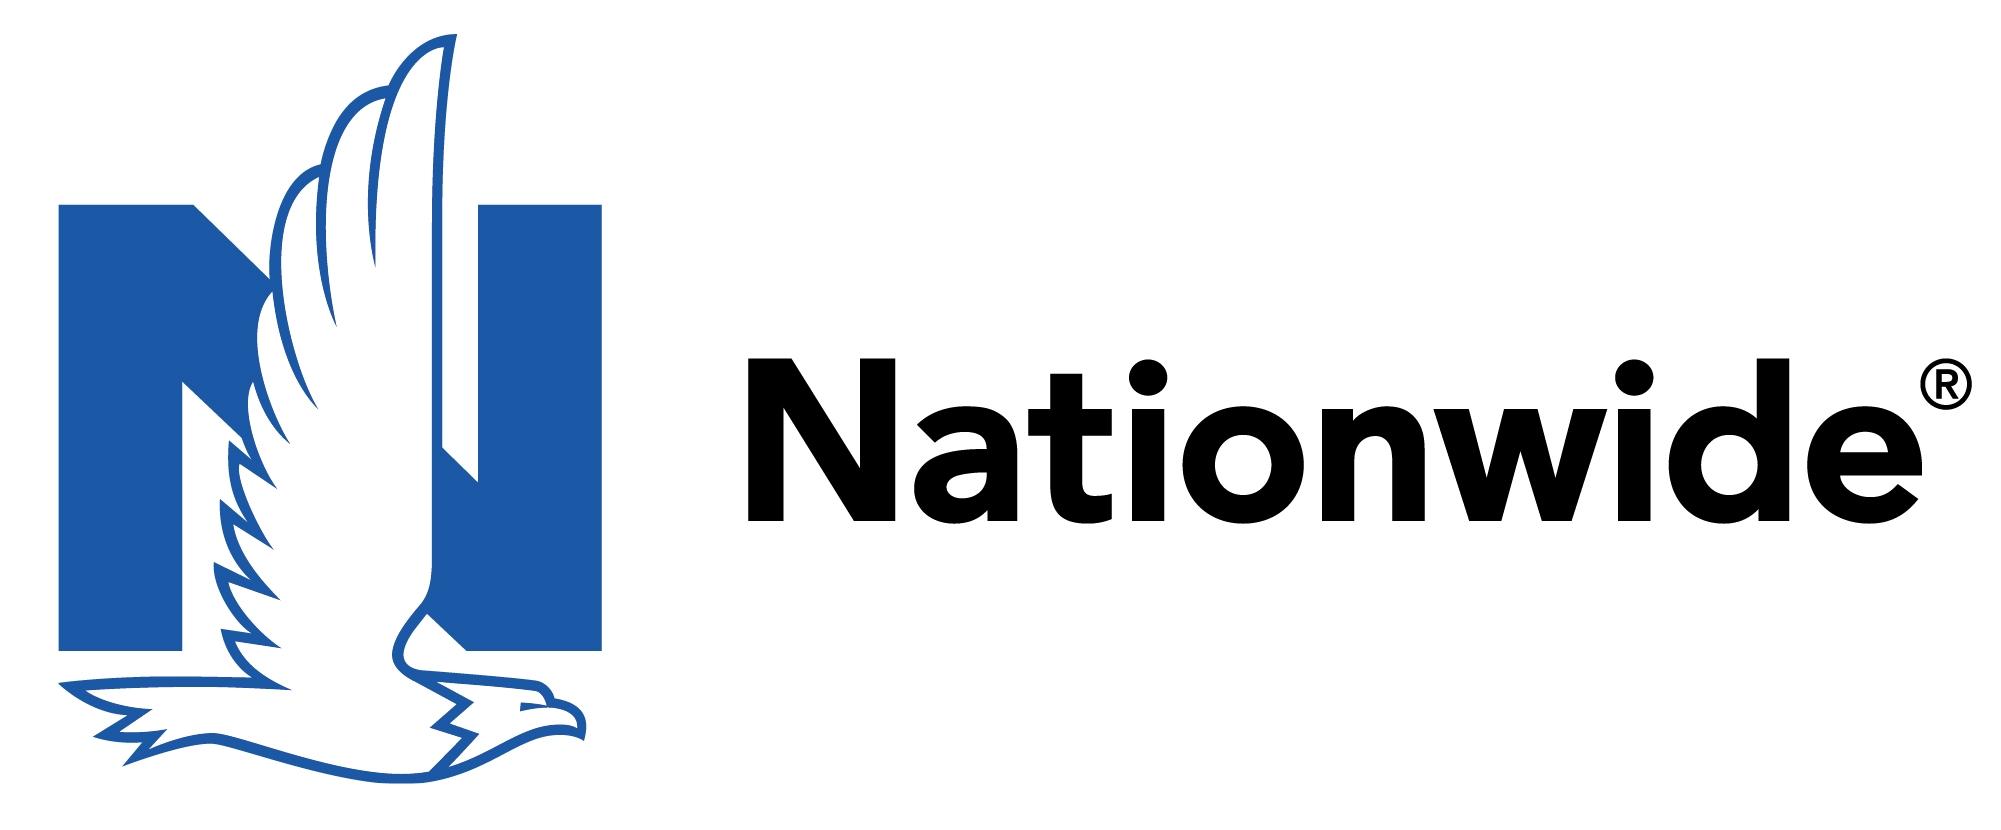 NandEagle Horiz NW 2C RGB high res.jpg.img.jpg